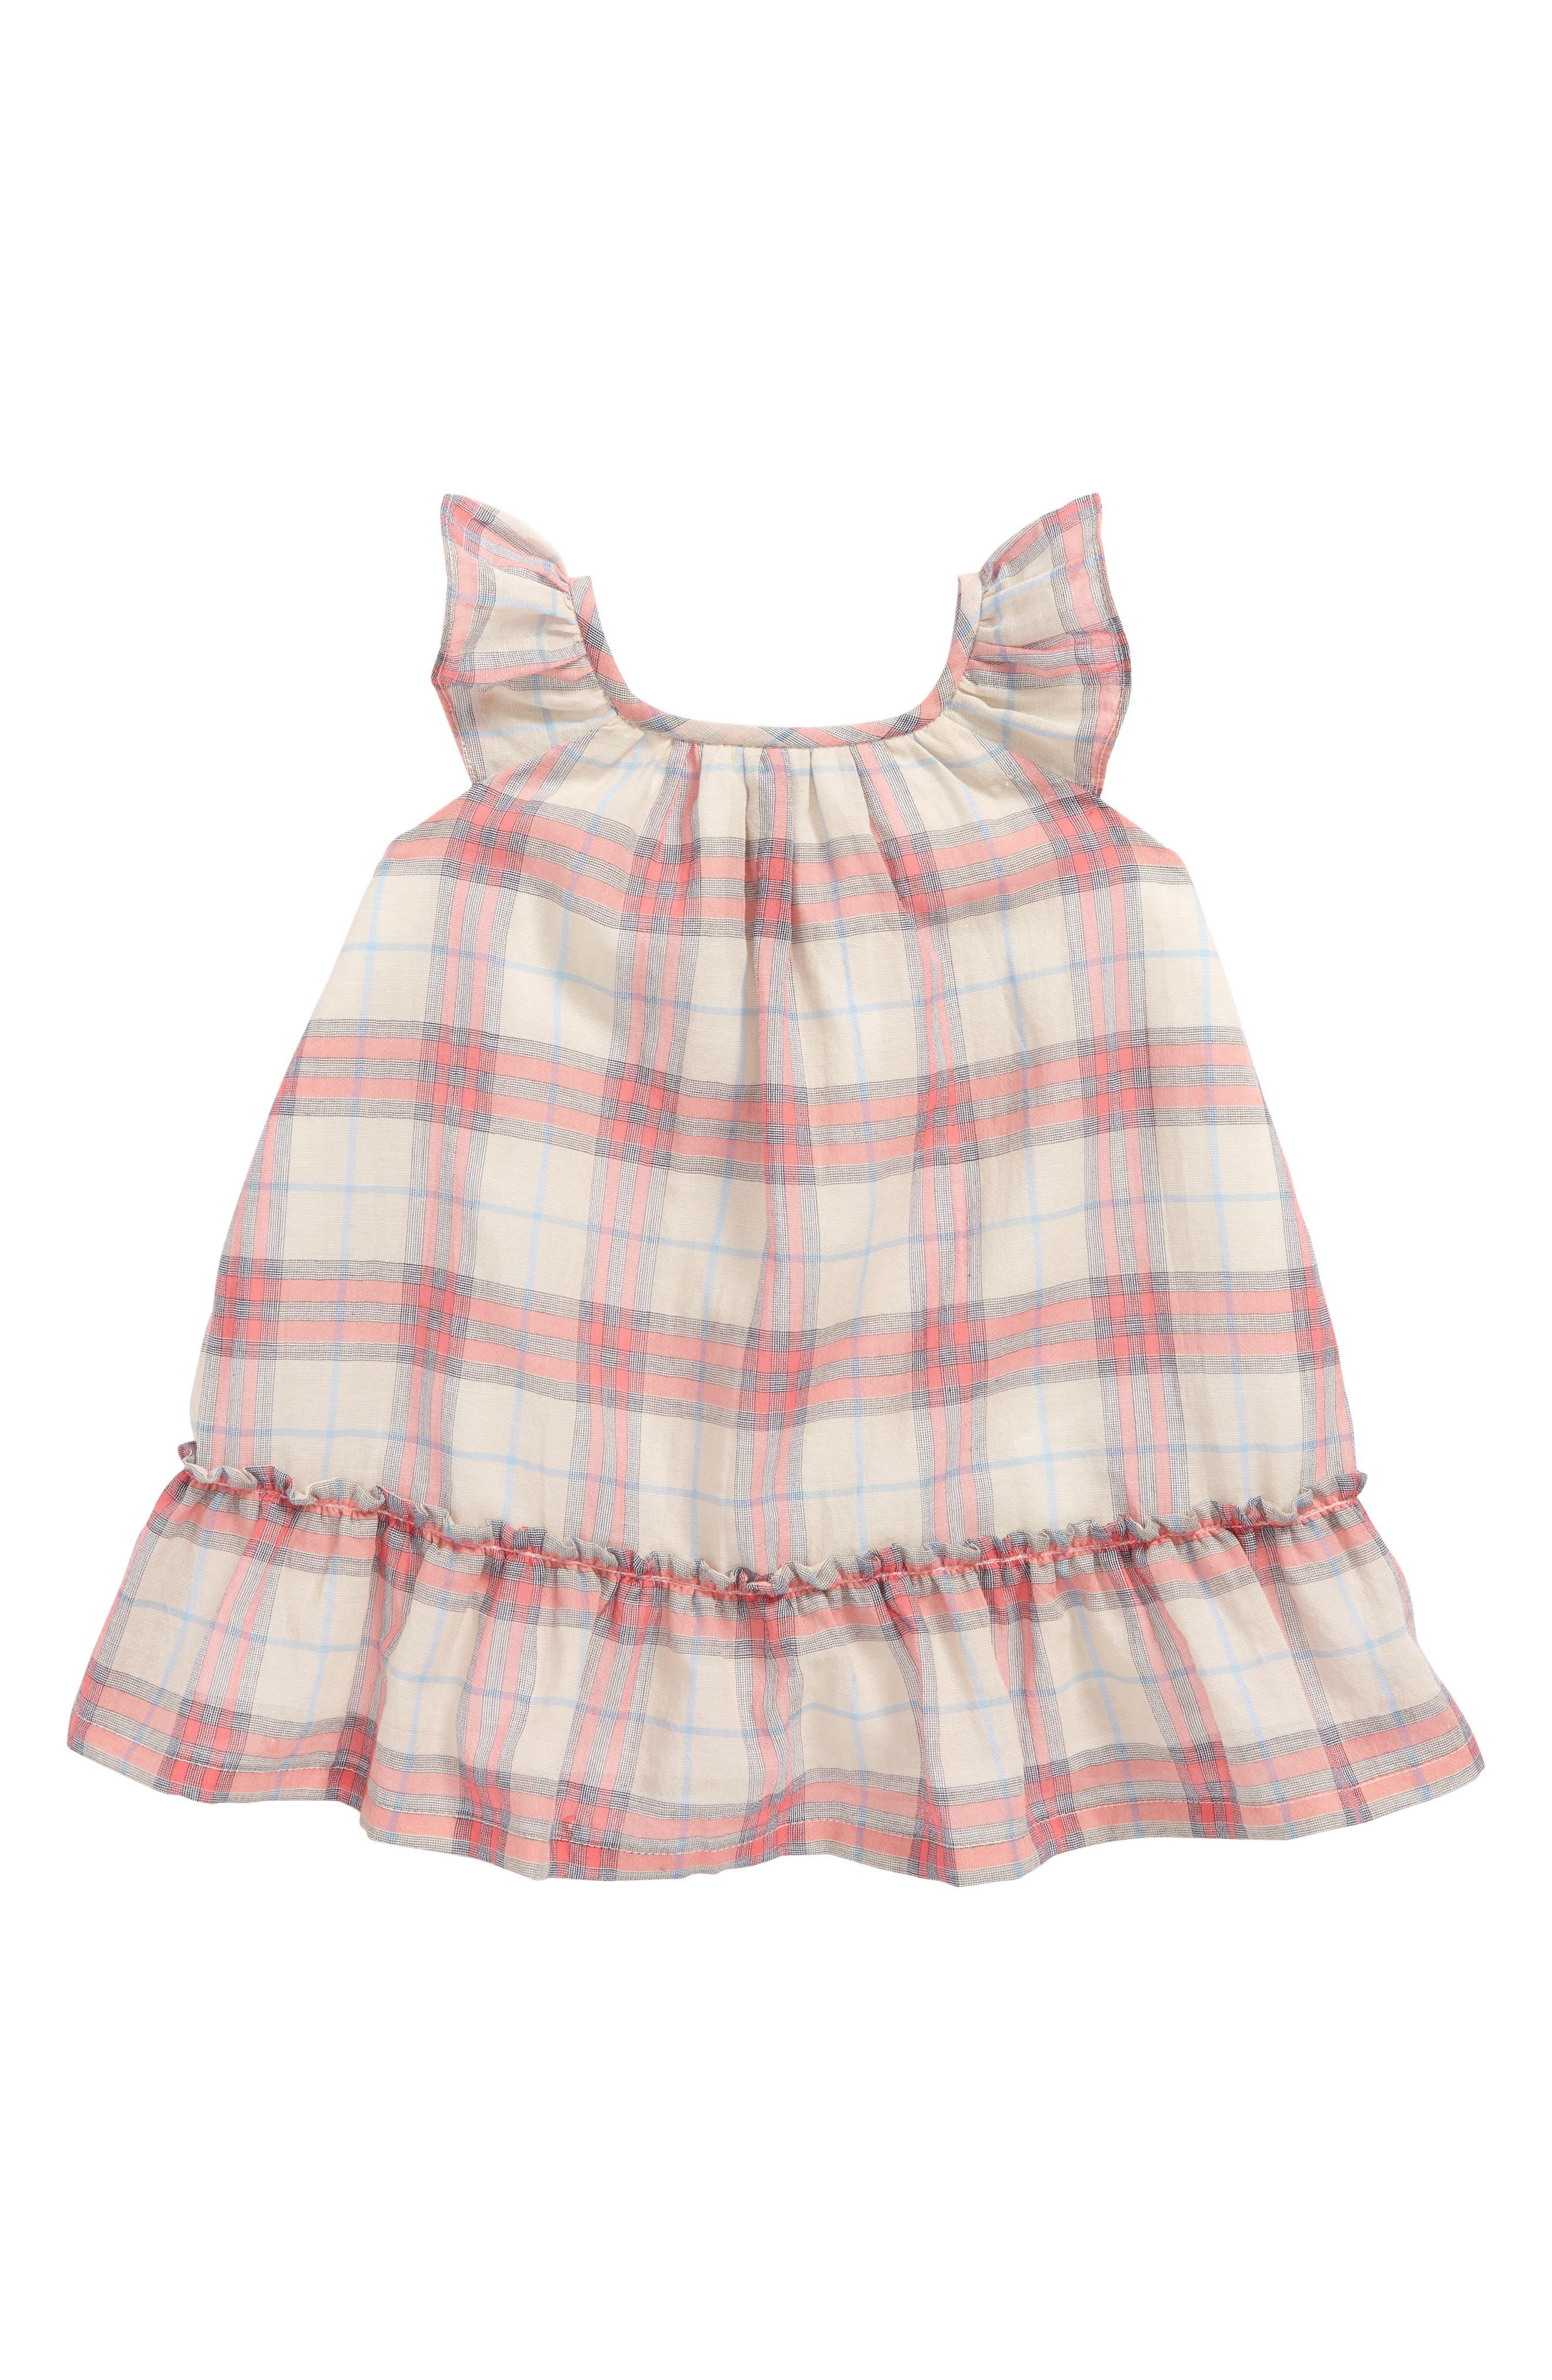 Burberry Tania Check Dress (Baby Girls)